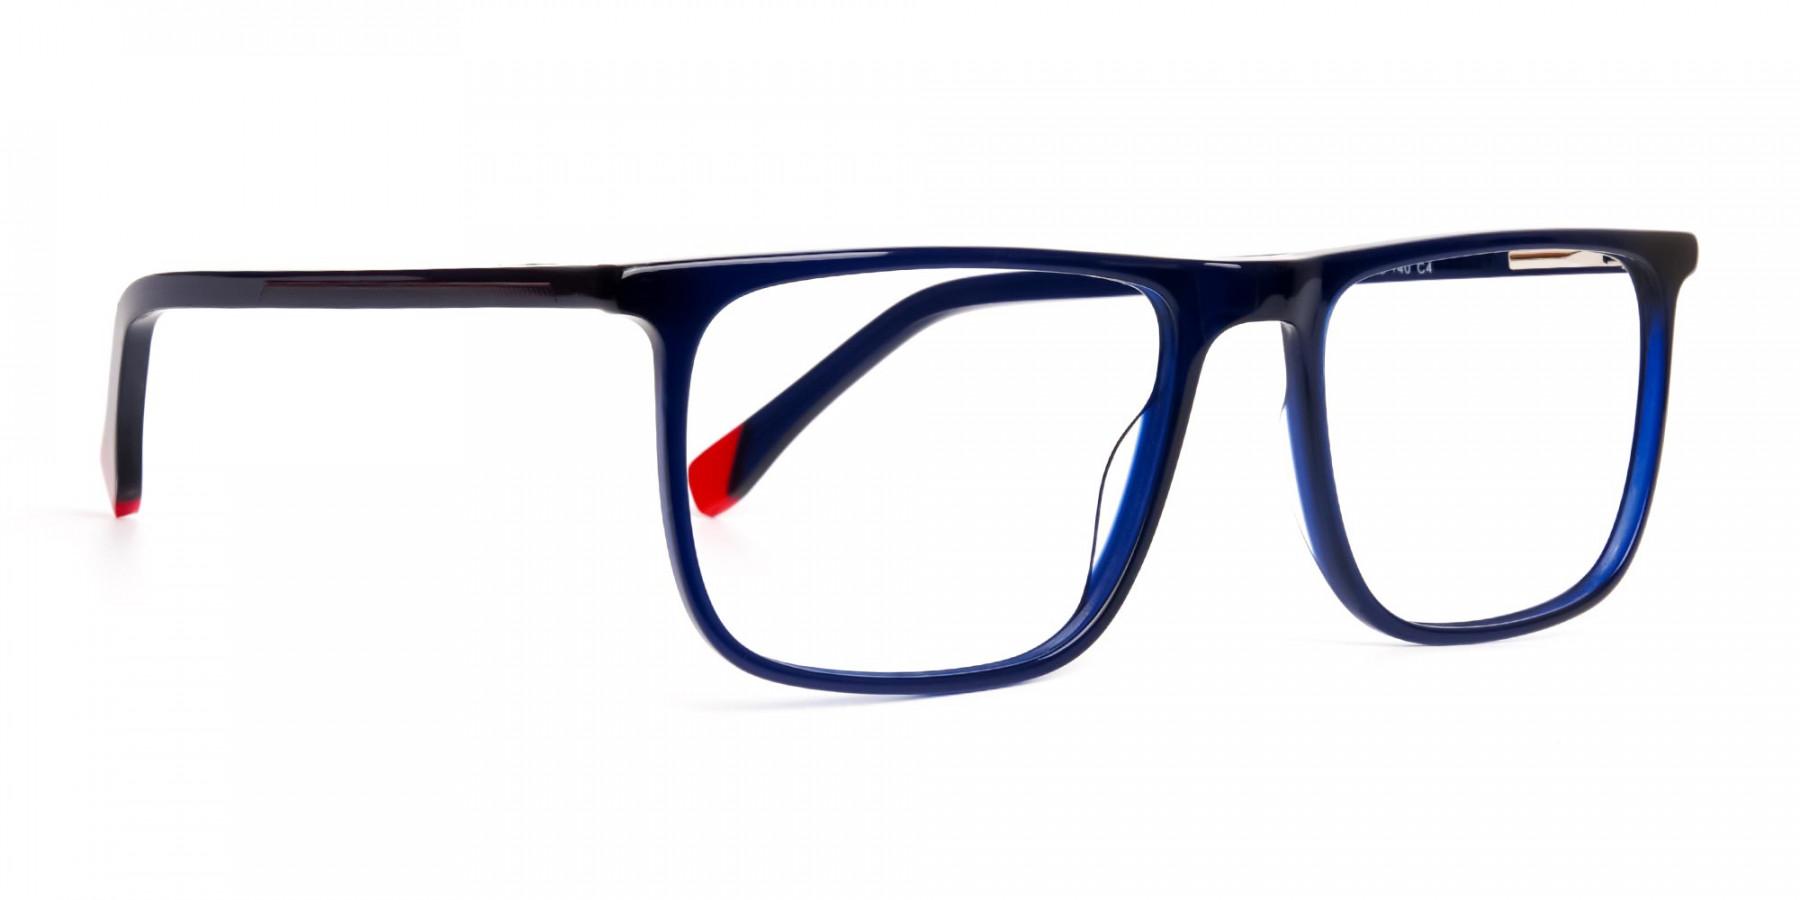 indigo-blue-rectangular-shape-glasses-frames-1